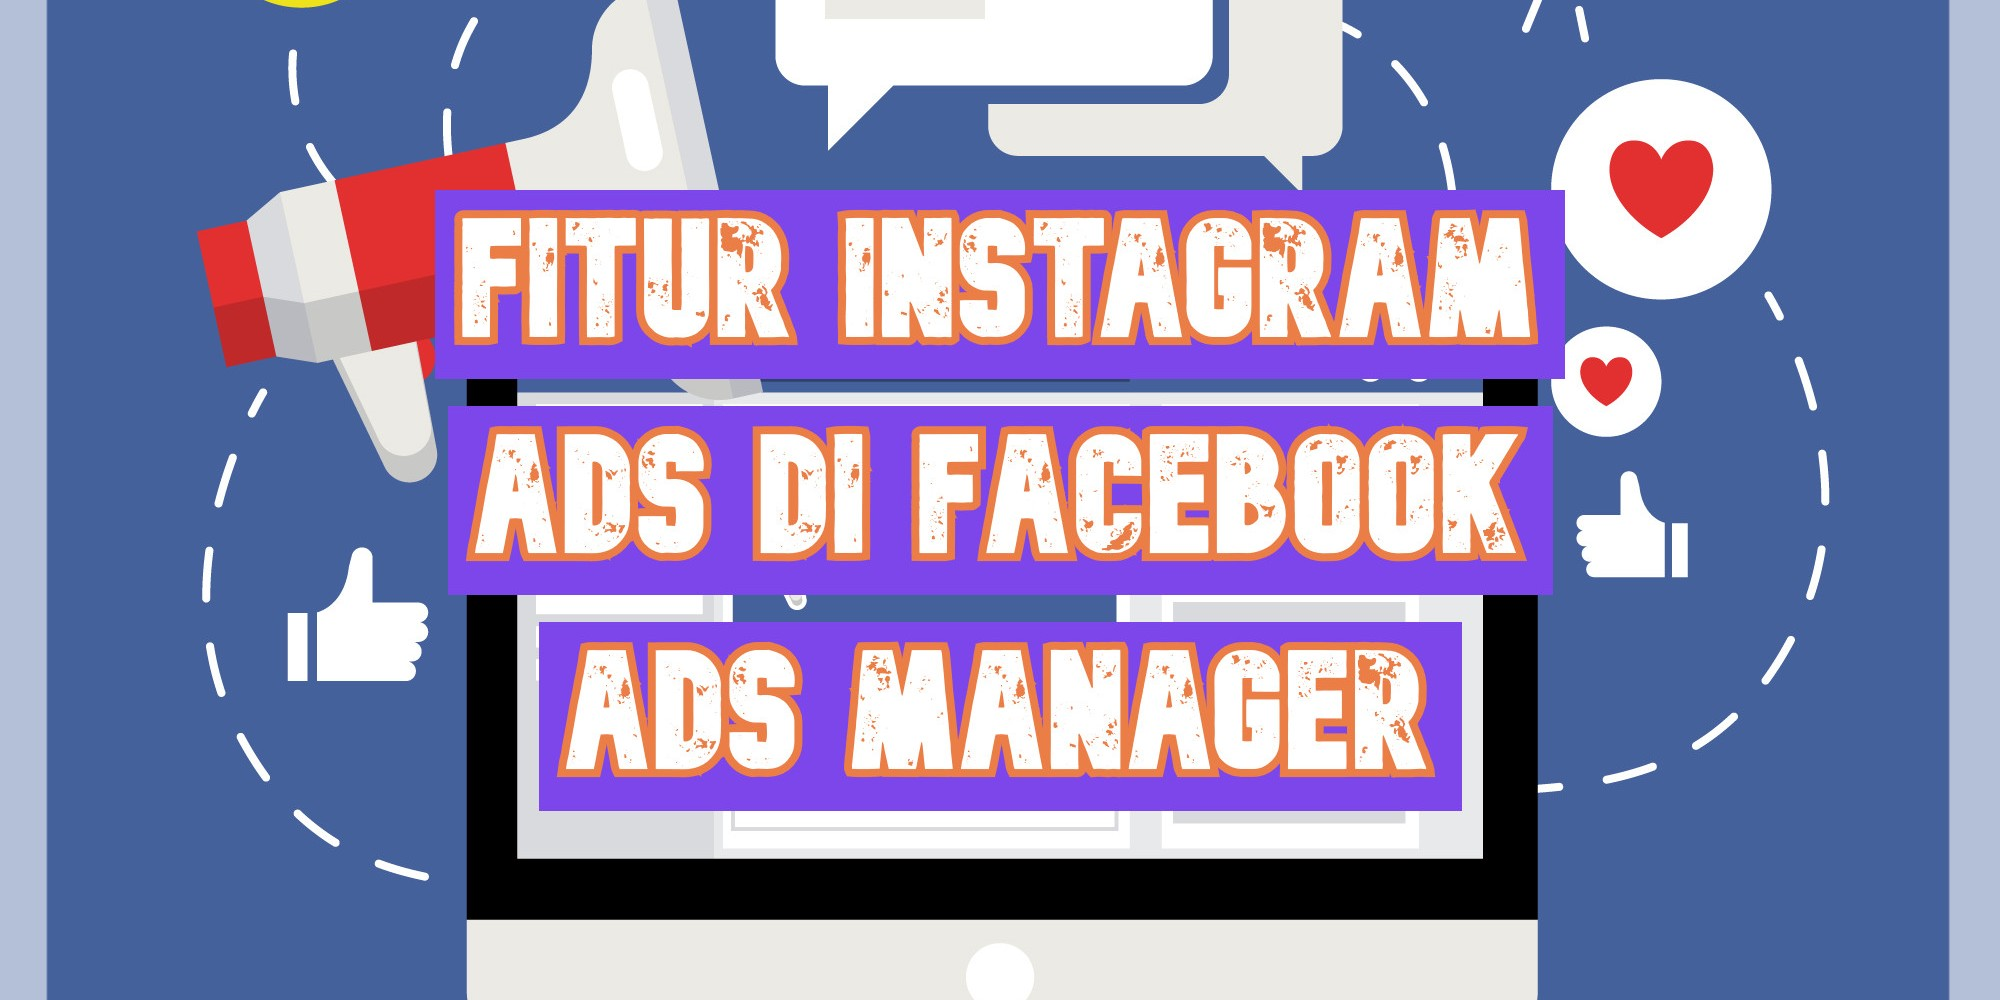 Fitur Instagram Ads di Facebook ads manager